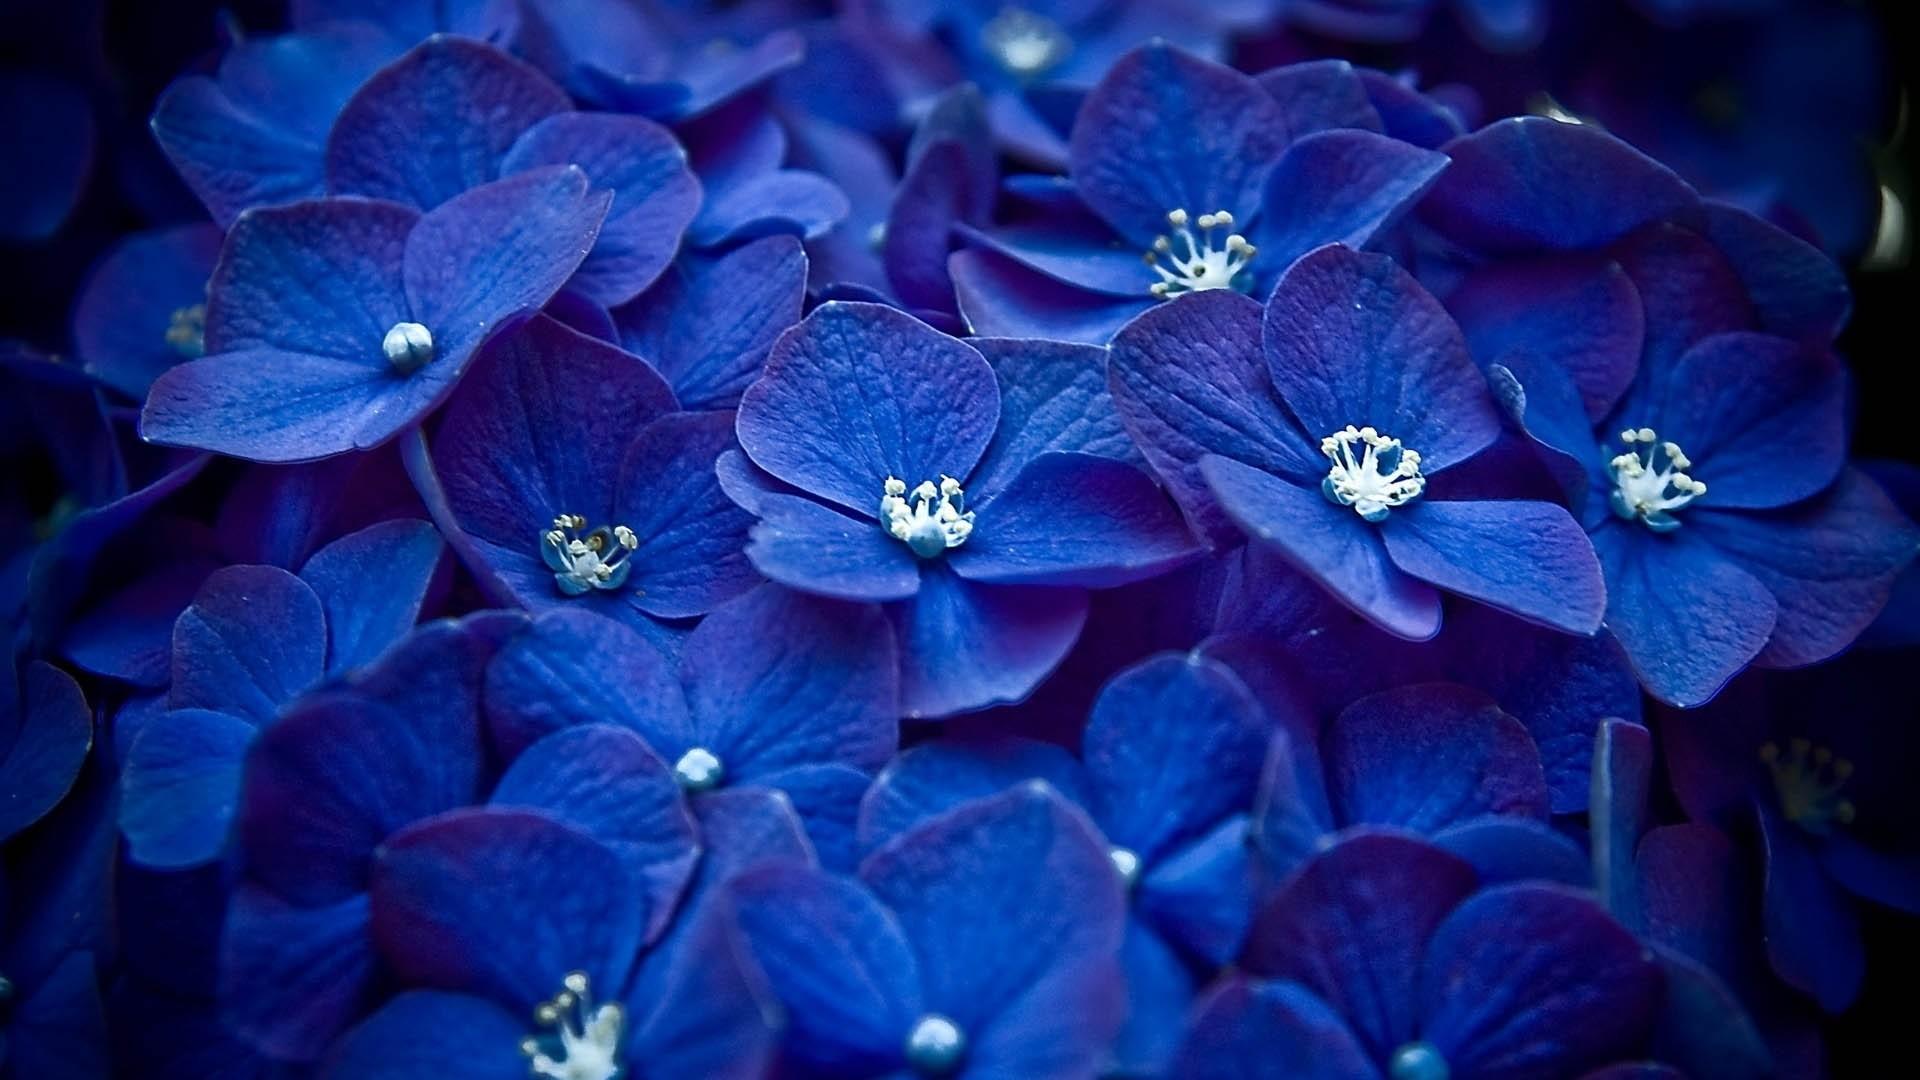 Blue Flower Download Wallpaper